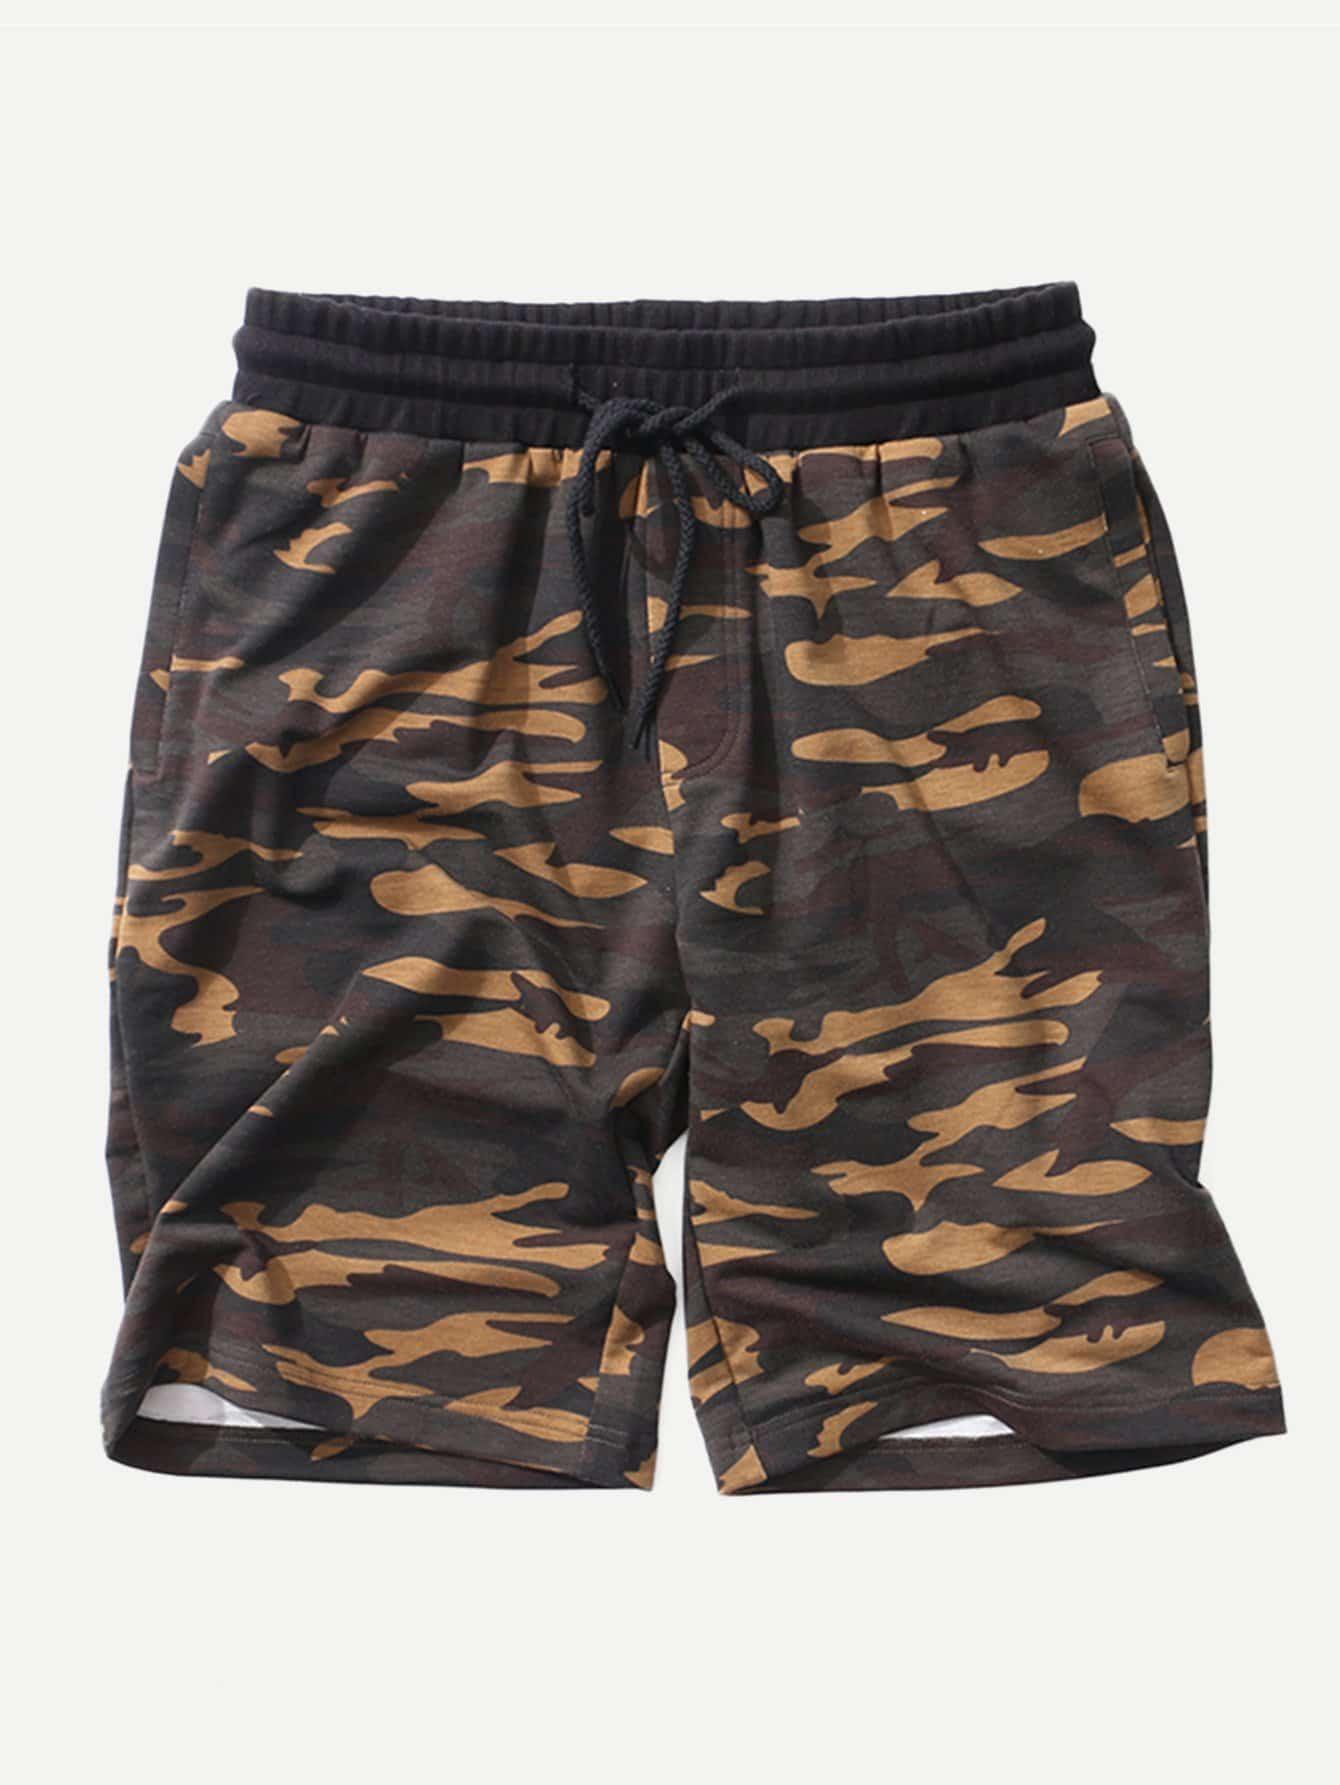 Men Cut And Sew Panel Camo Shorts men cut and sew panel beach shorts